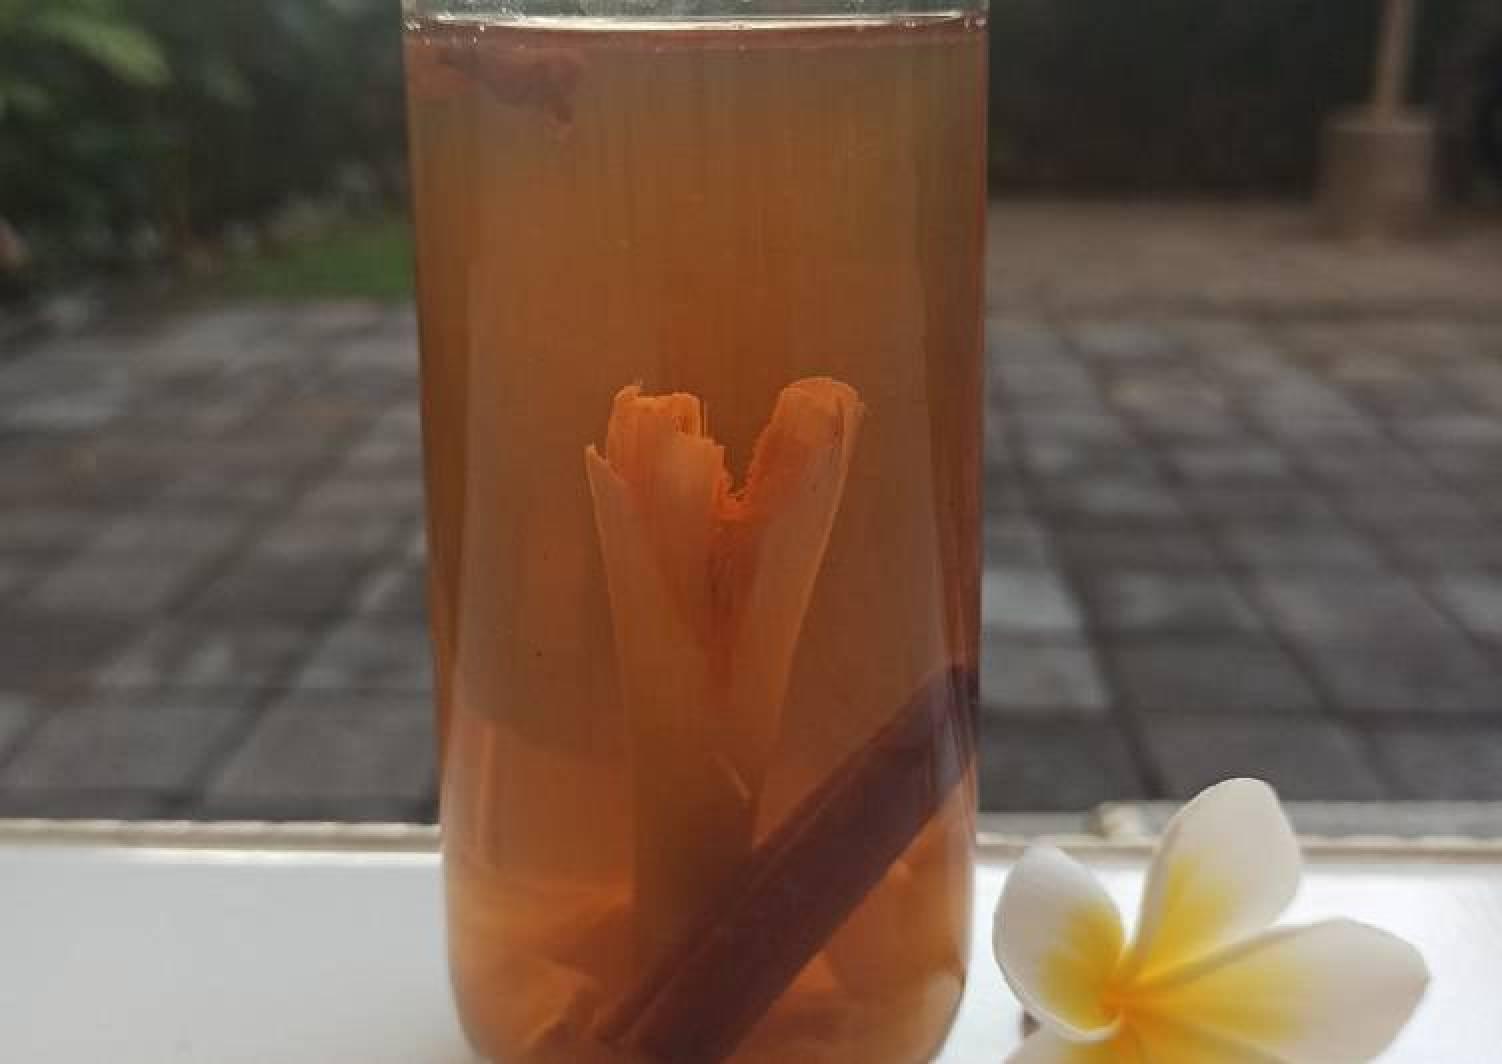 My Homemade Herbal Tea